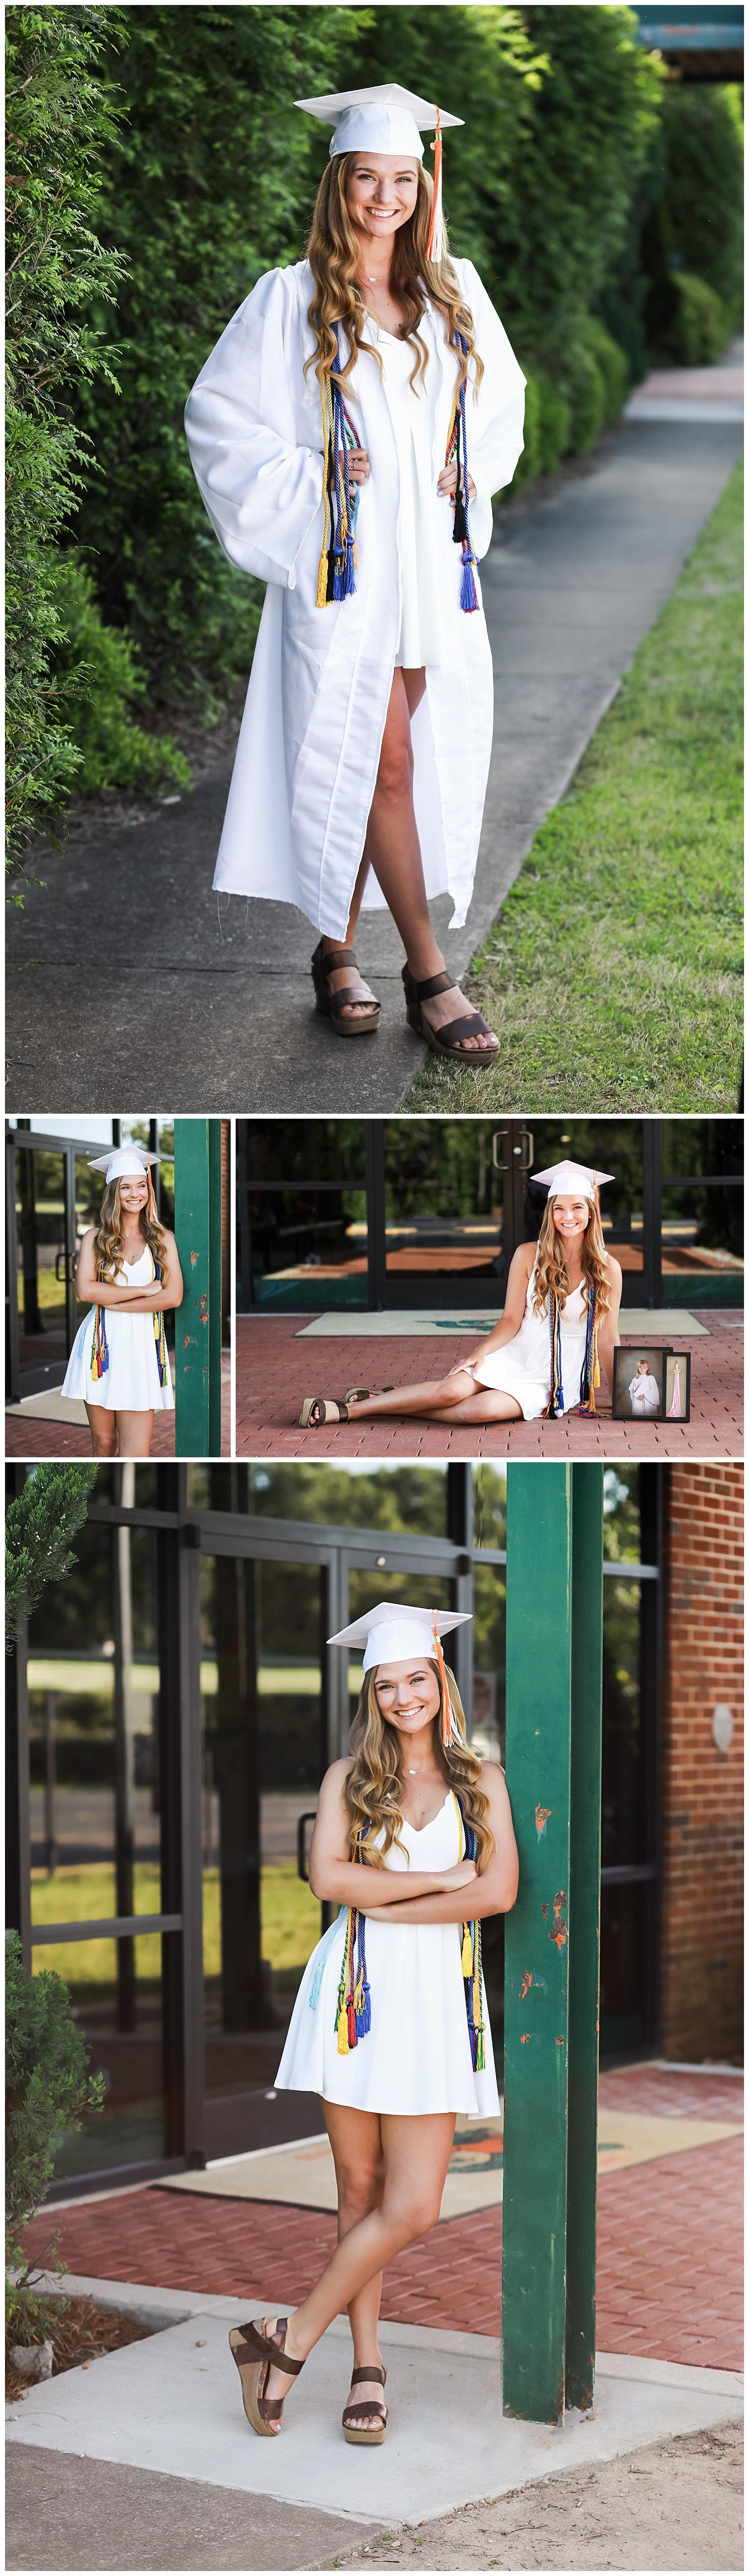 glenwood school graduation photos lbeesleyphoto auburn opelika smiths station